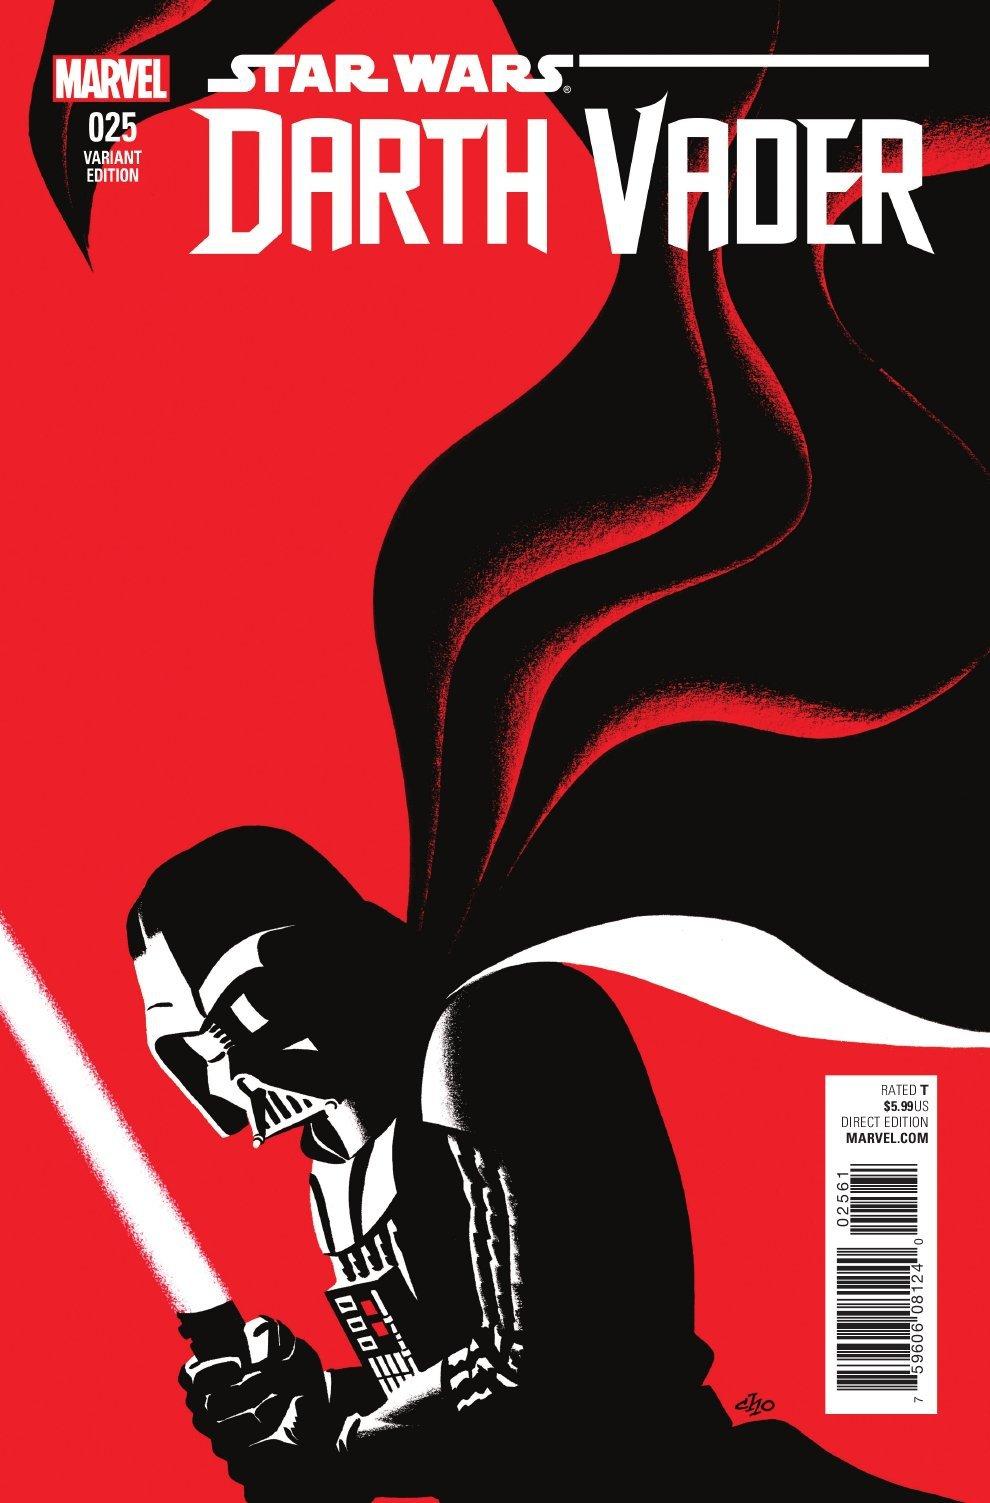 Darth Vader #25 (Michael Cho Variant Cover) (12.10.2016)